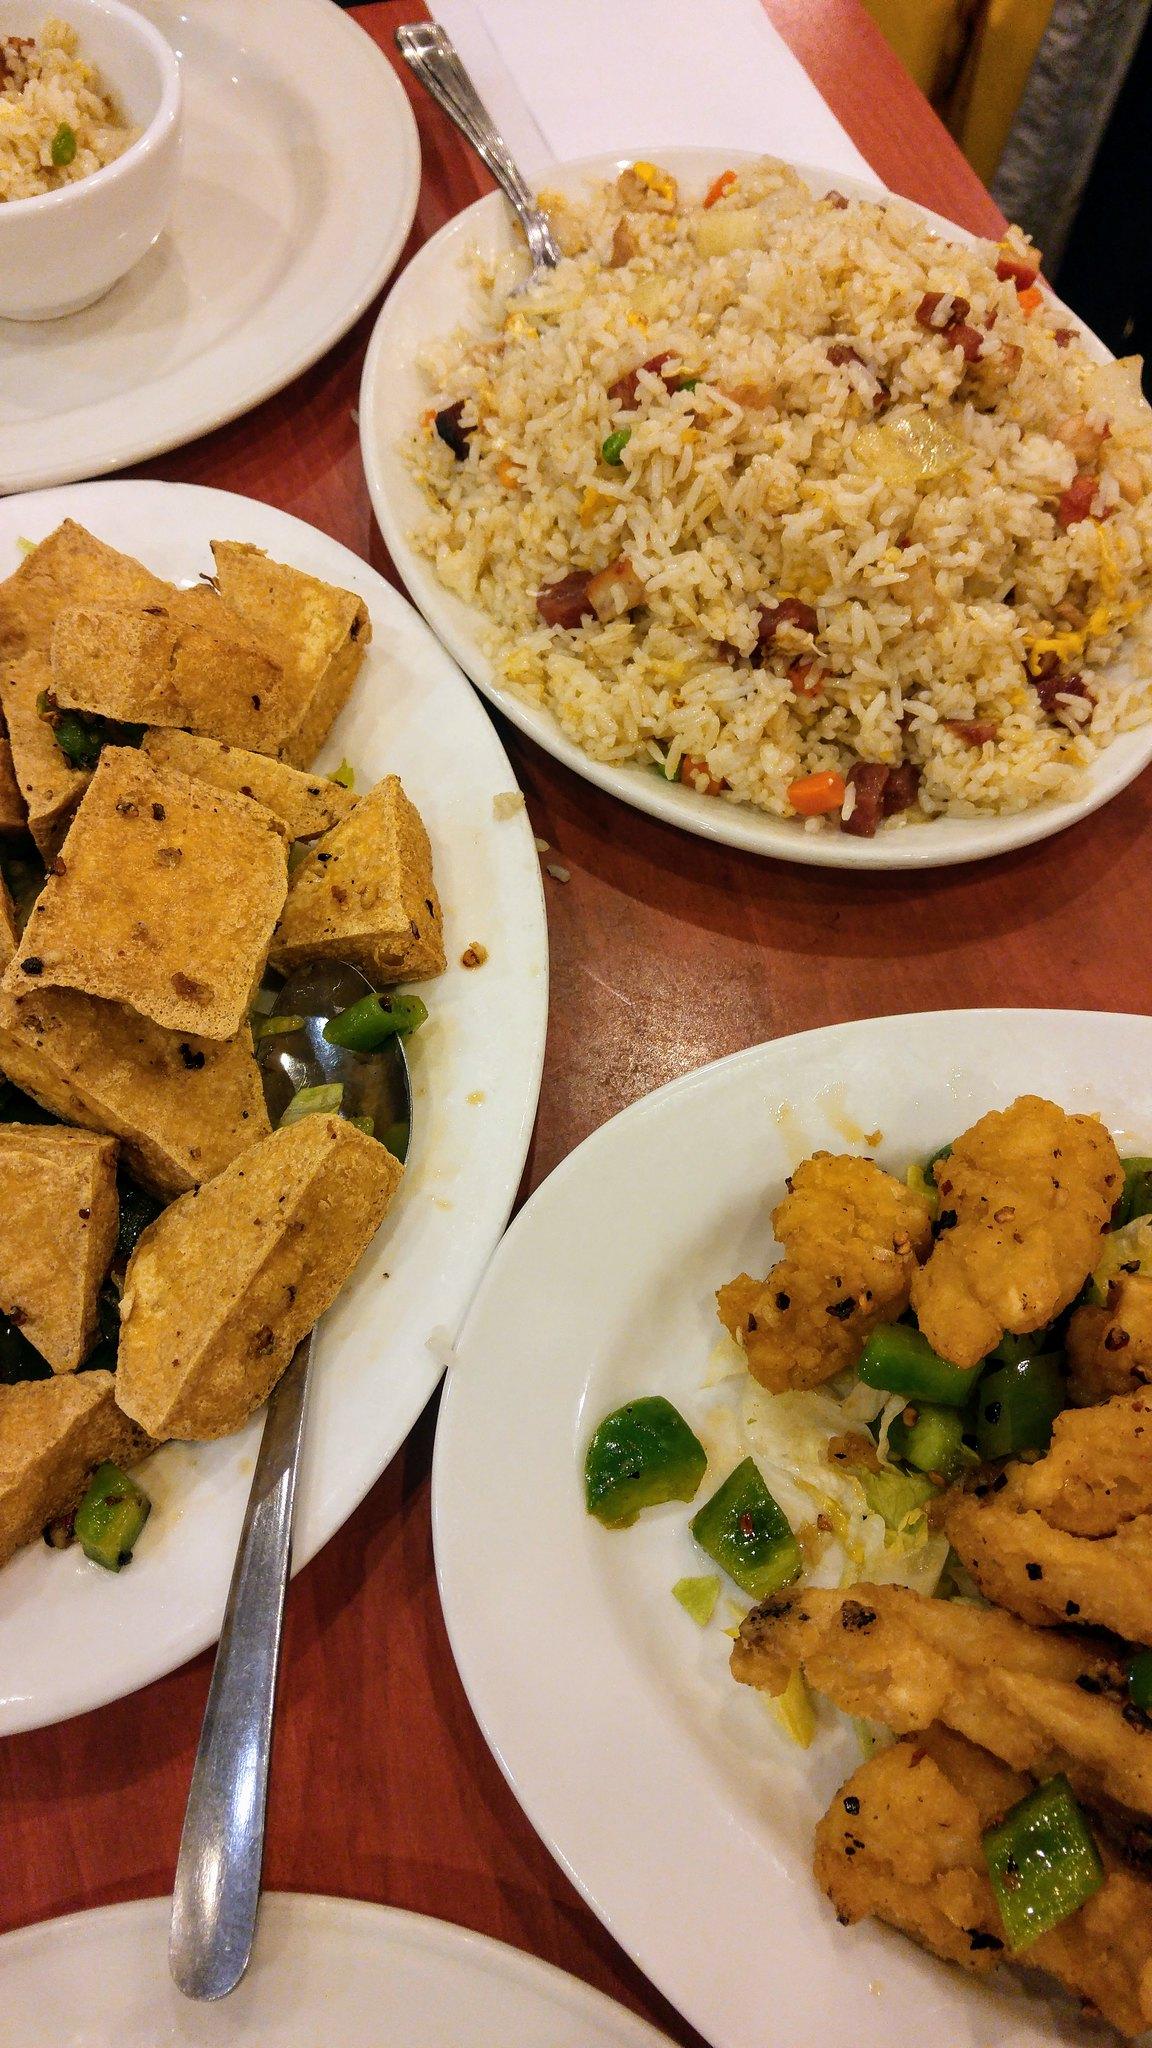 Restaurant Mon Shing plats chinois tofu bouffe repas asiatique